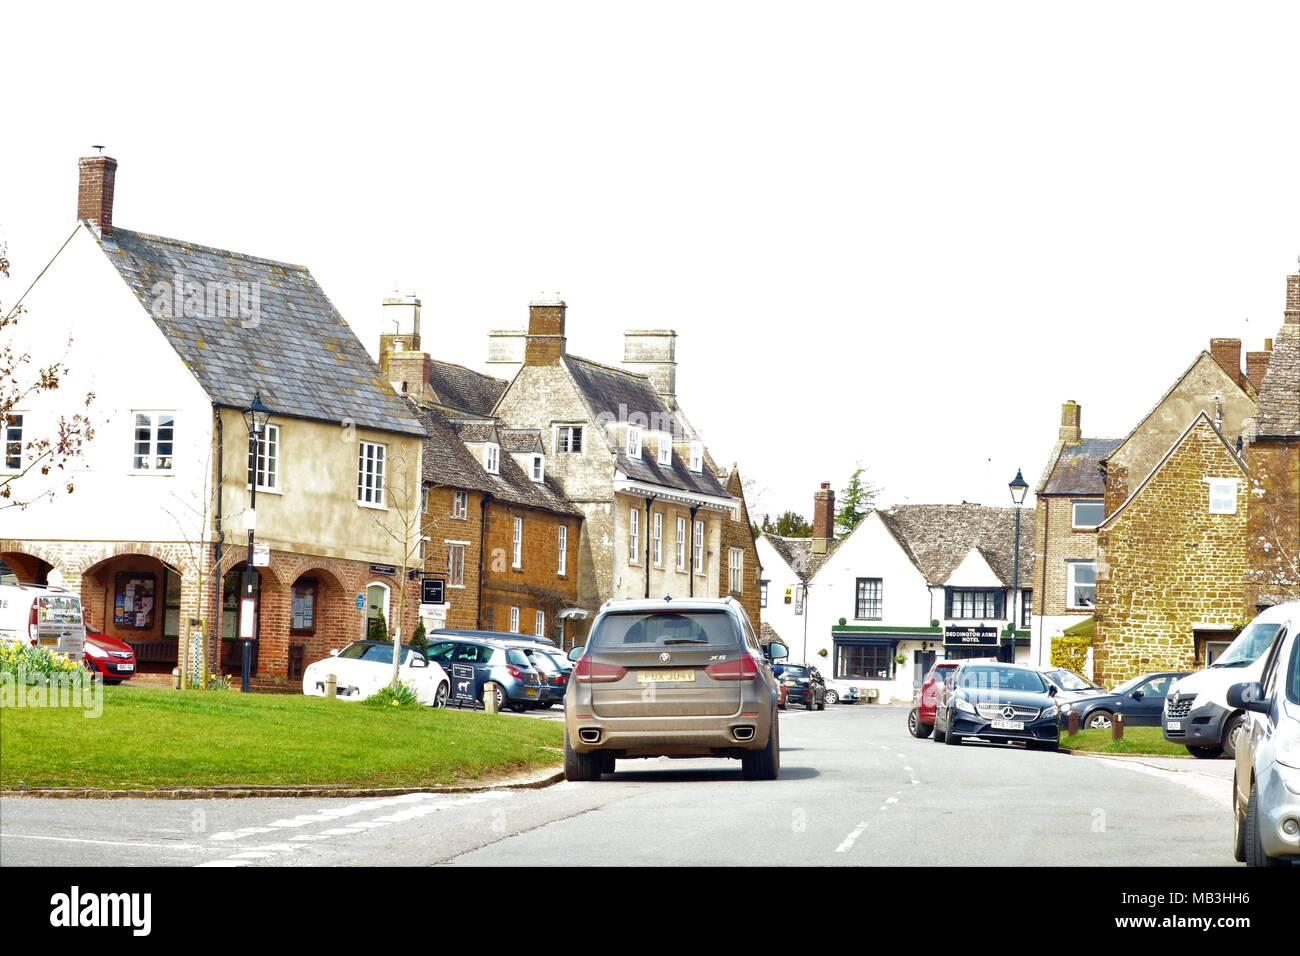 Deddington Town High Street, Oxfordshire, UK - Stock Image